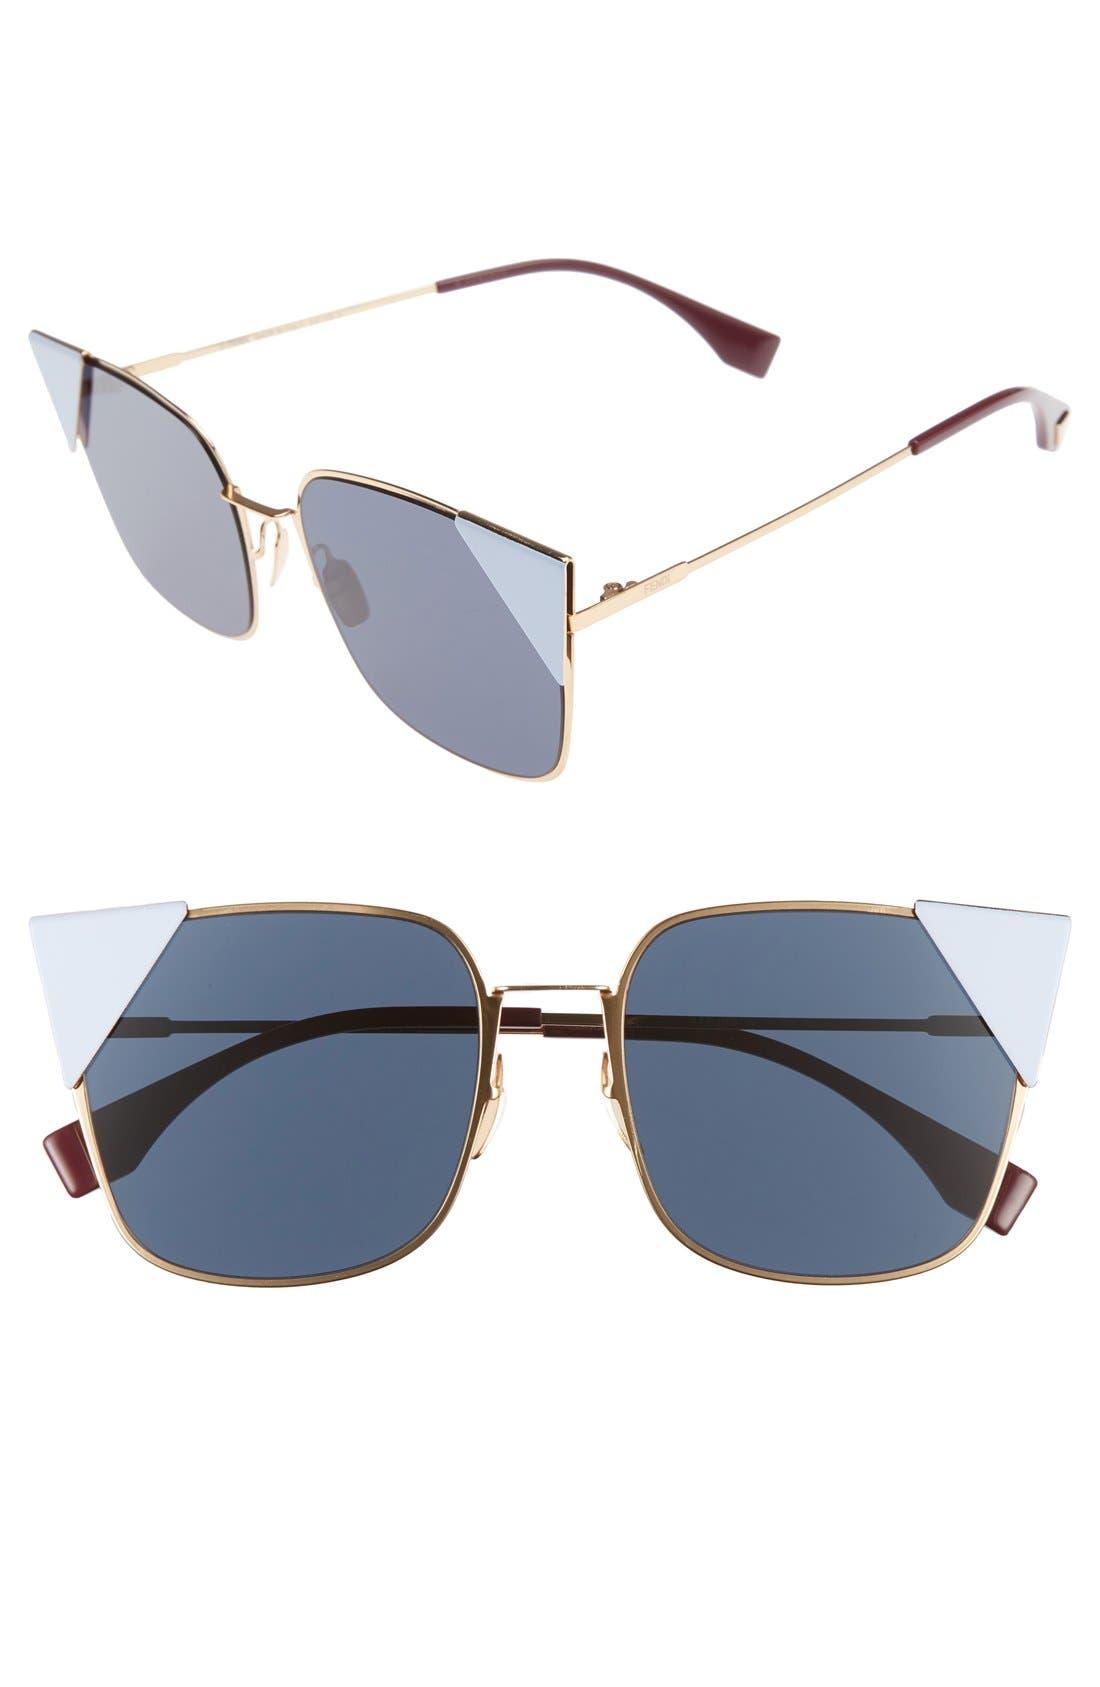 55mm Tipped Cat Eye Sunglasses,                         Main,                         color, ROSE METALLIC GOLD